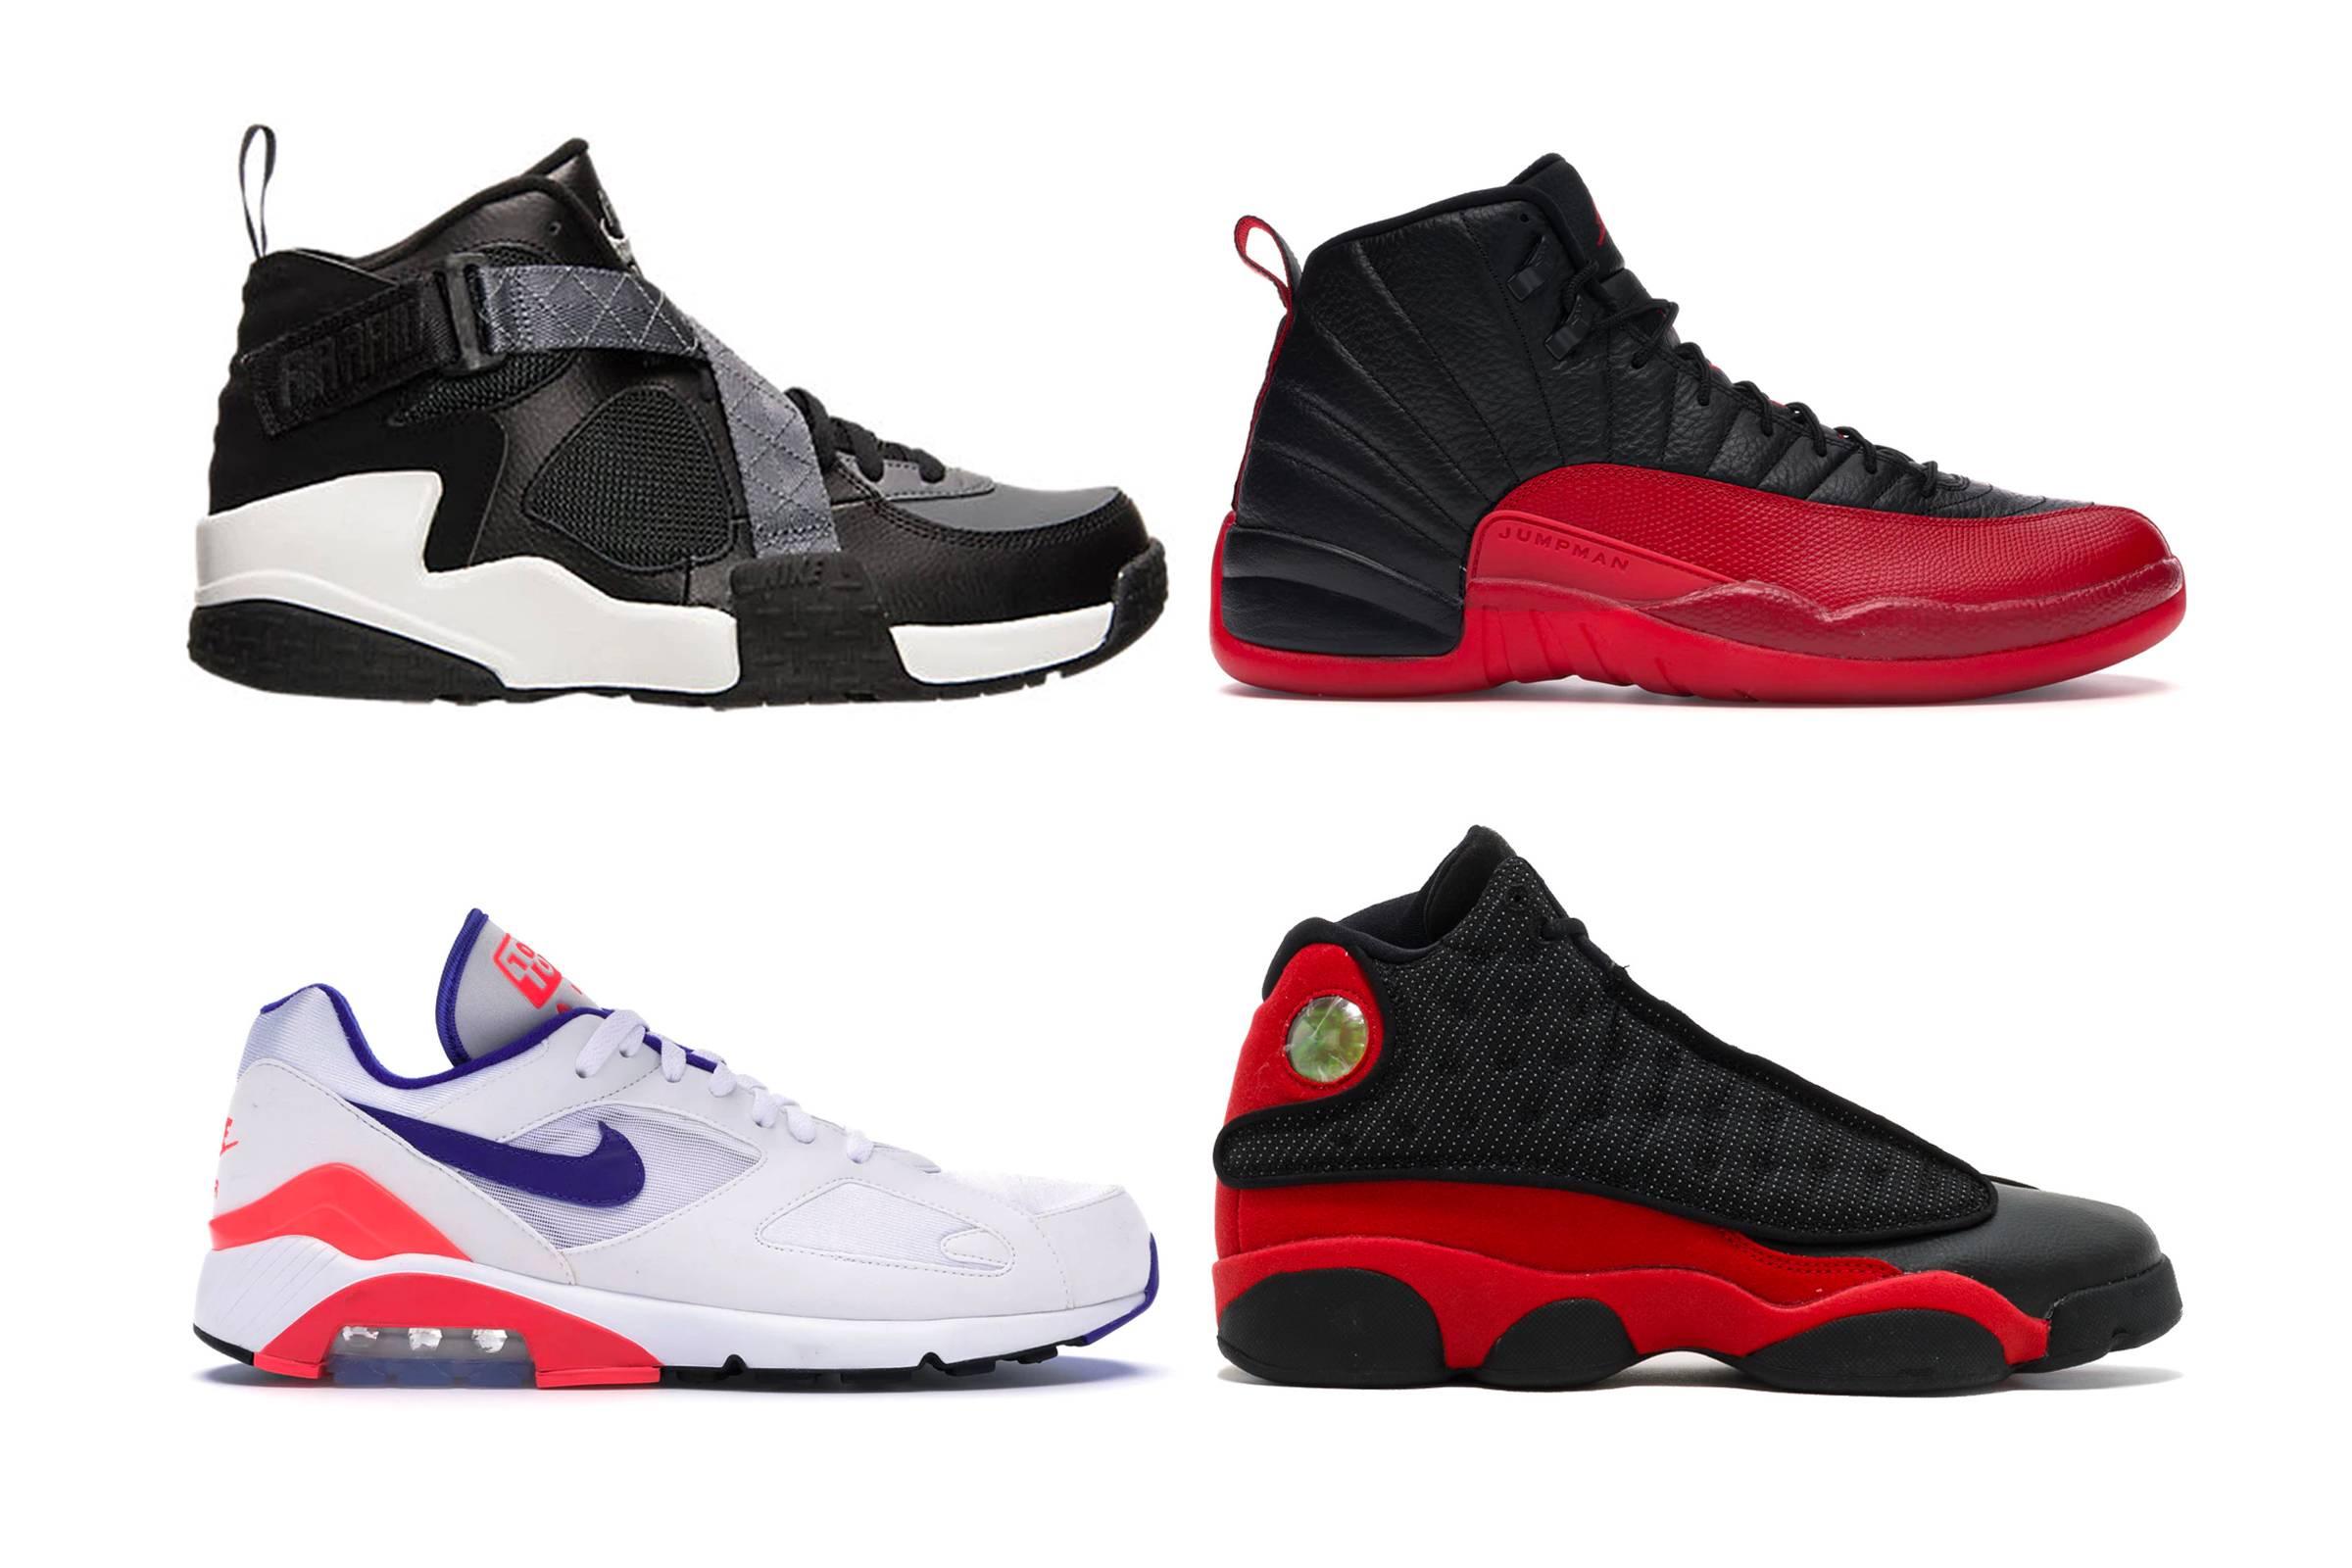 Honorable Mentions: Nike Air Raid, Jordan XII, Jordan XIII, Nike Air Max 180